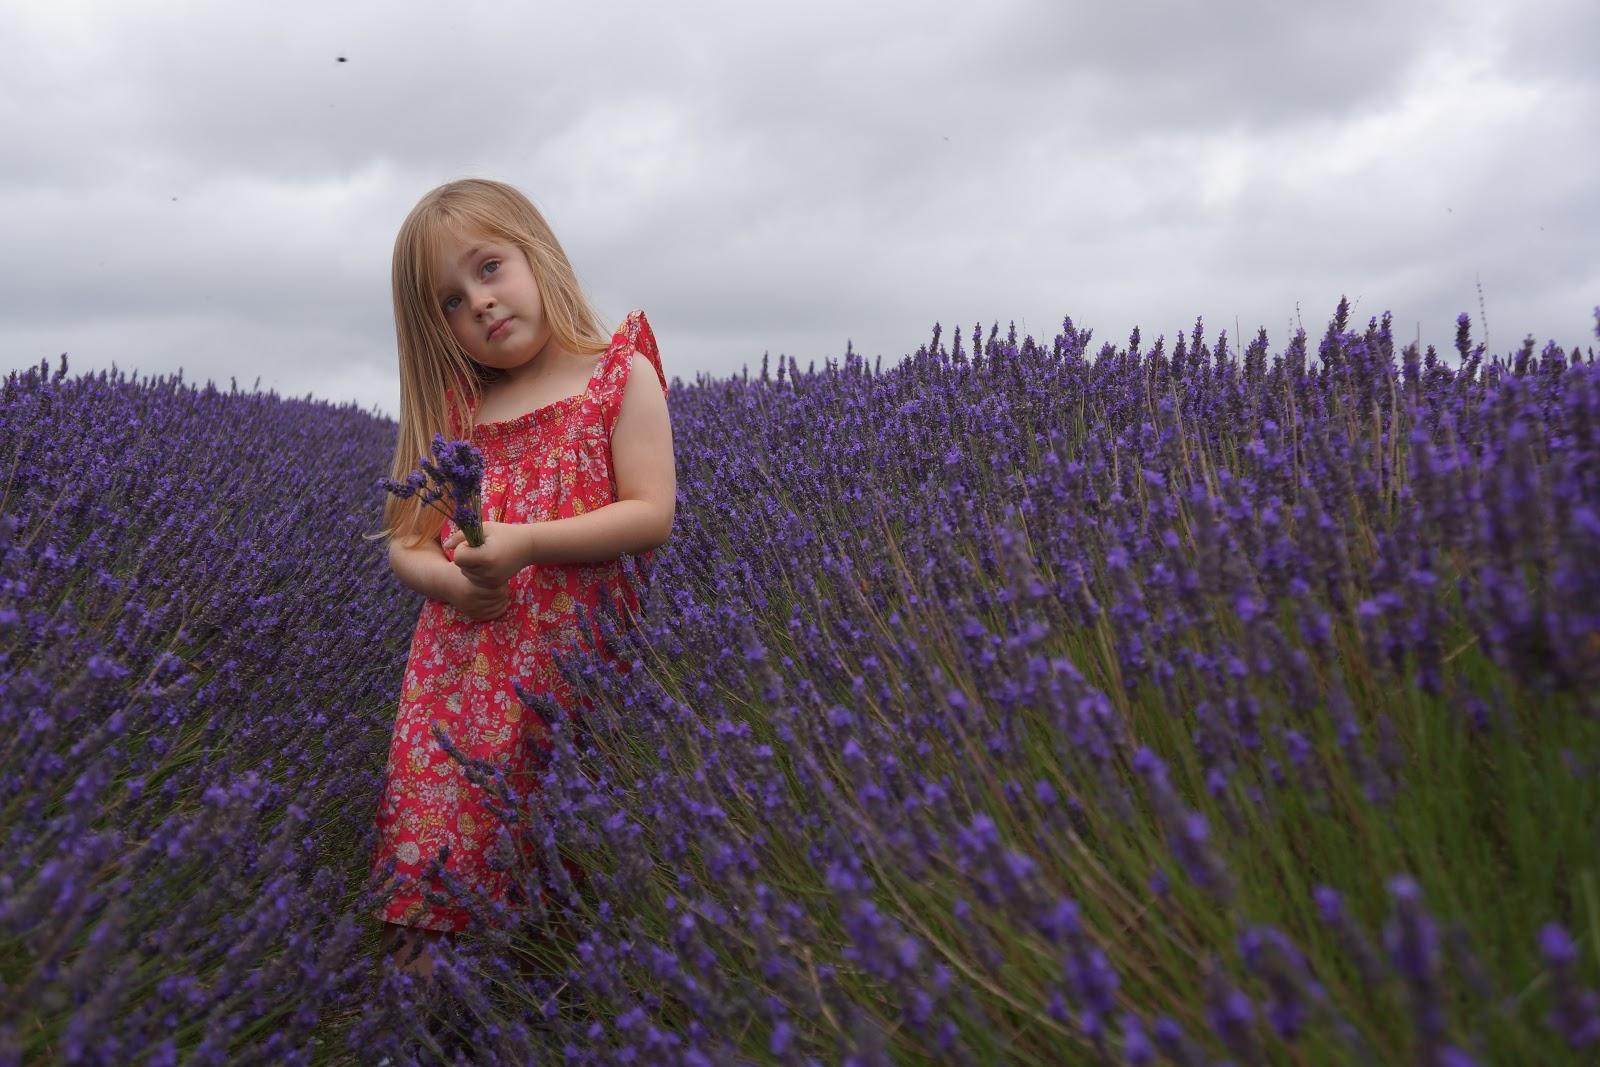 little girl standing on a lavender field